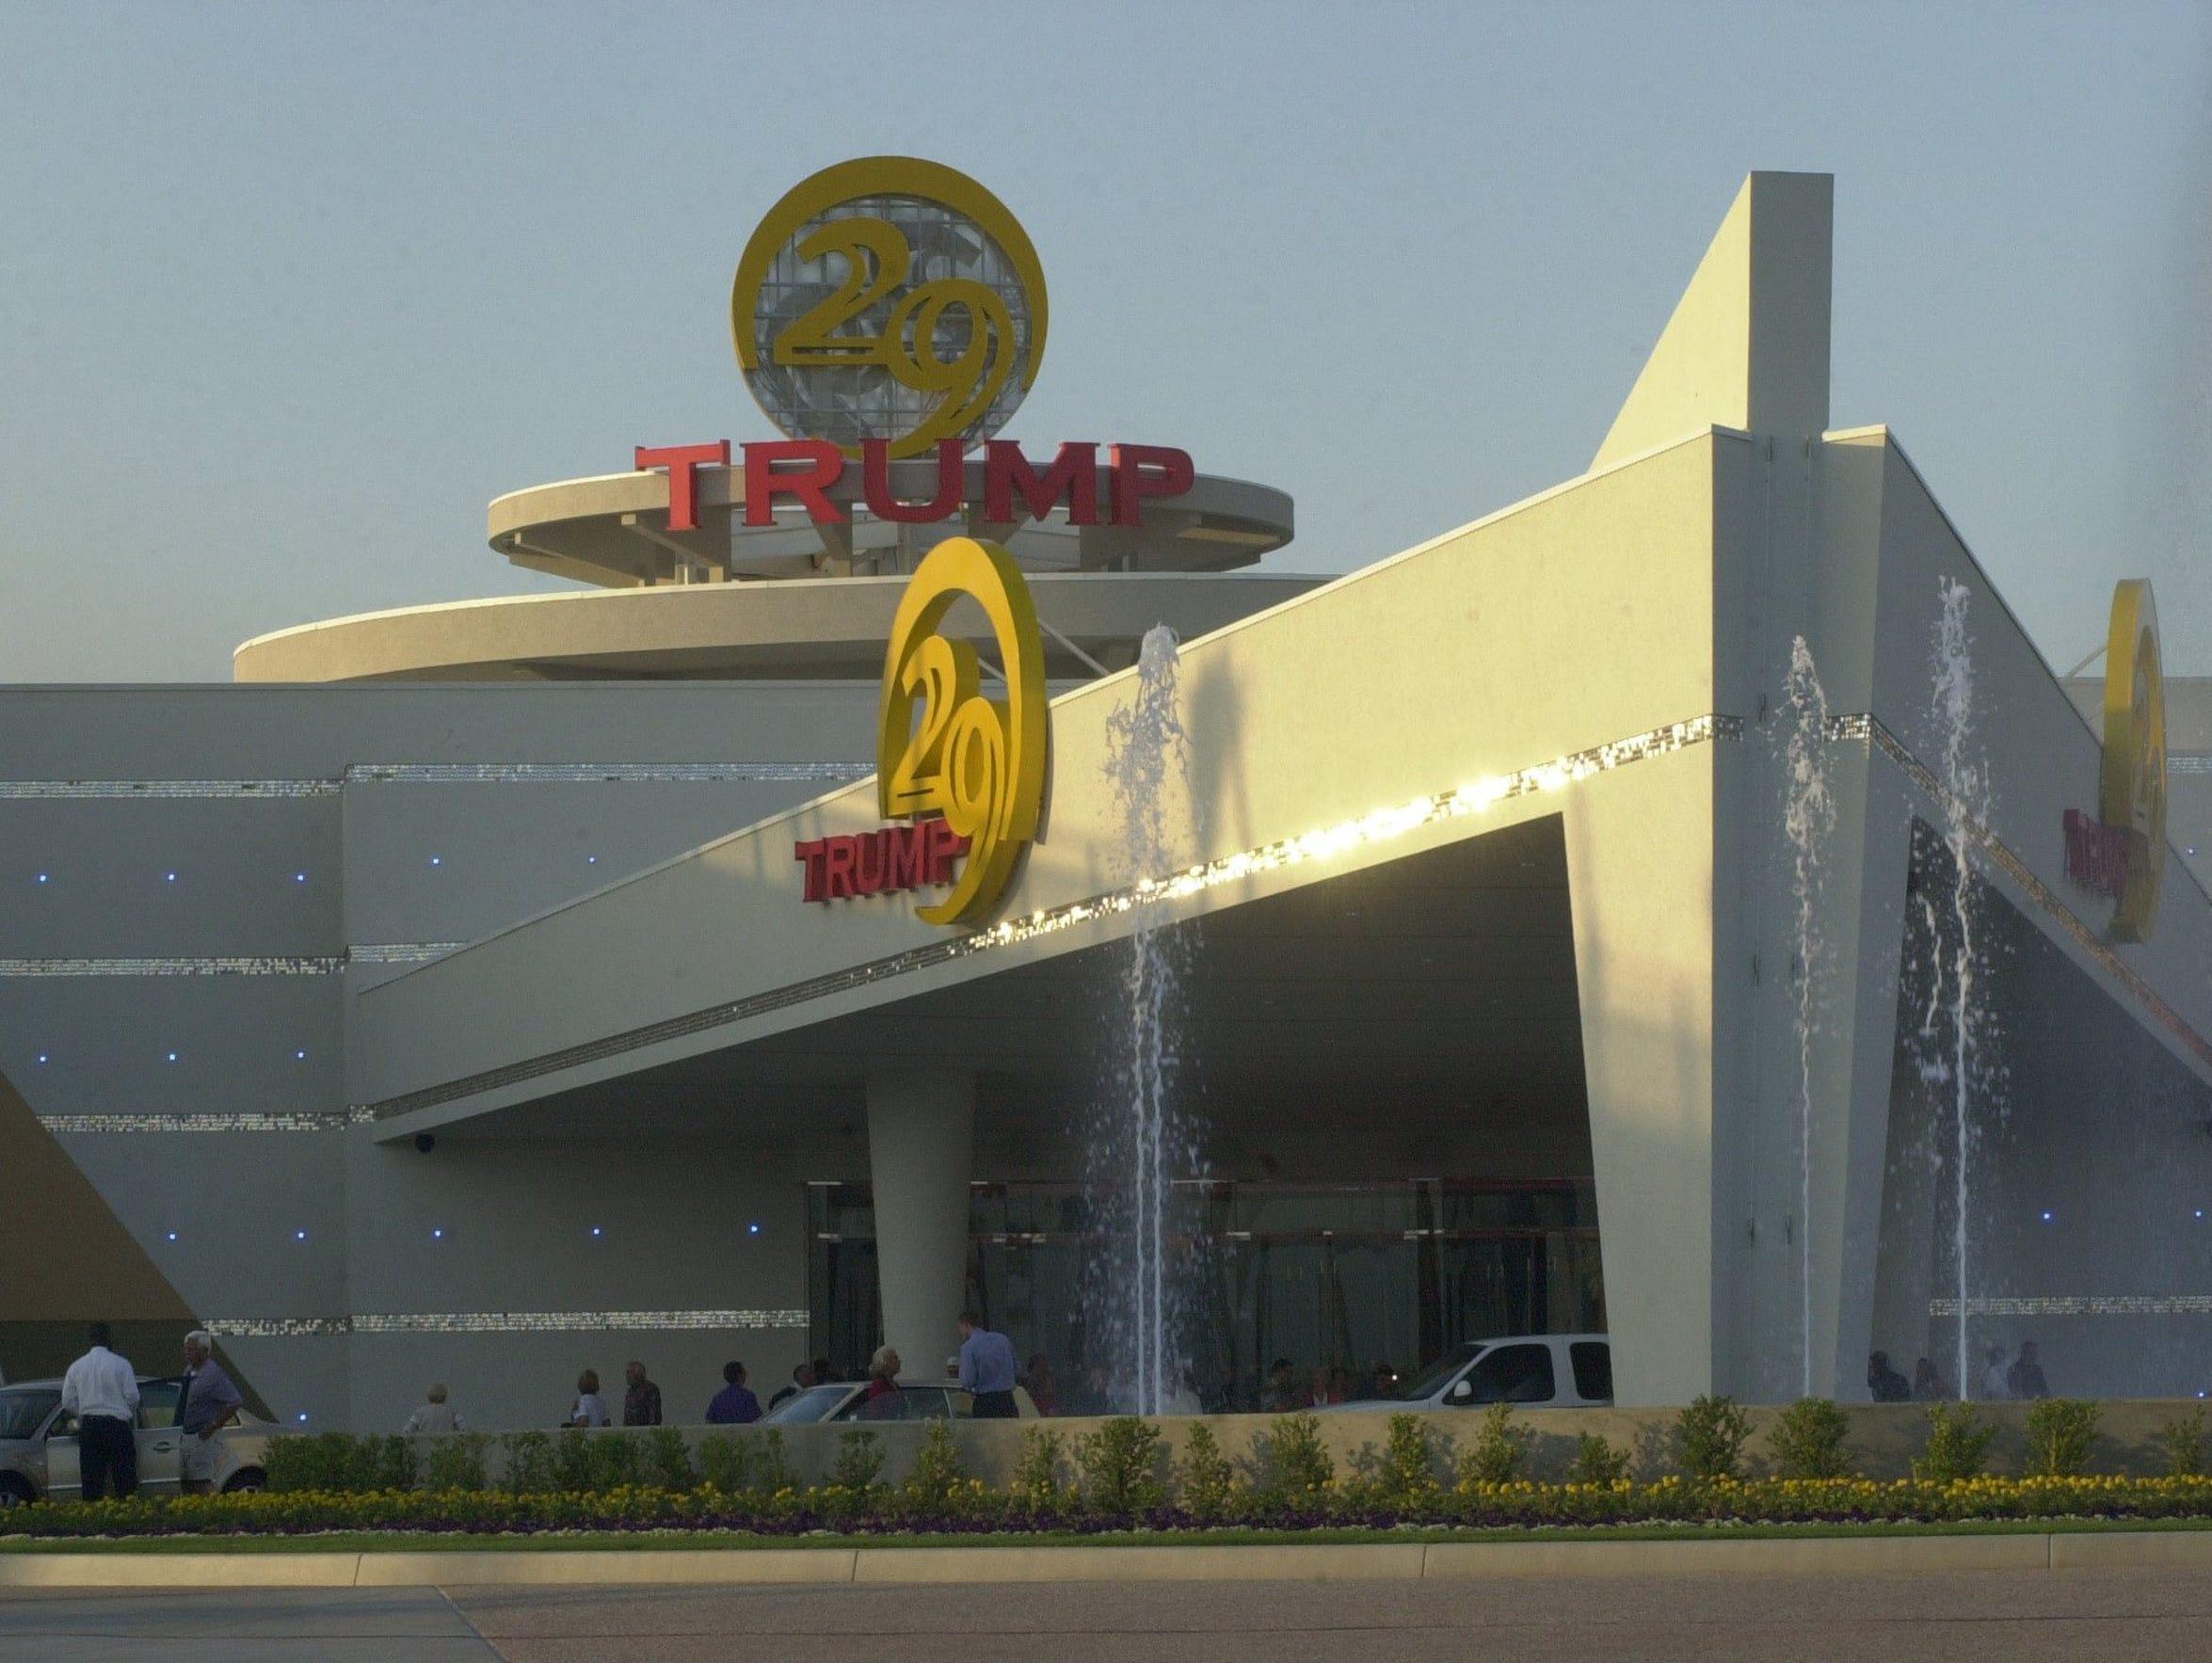 29 casino tribe trump star city casino location